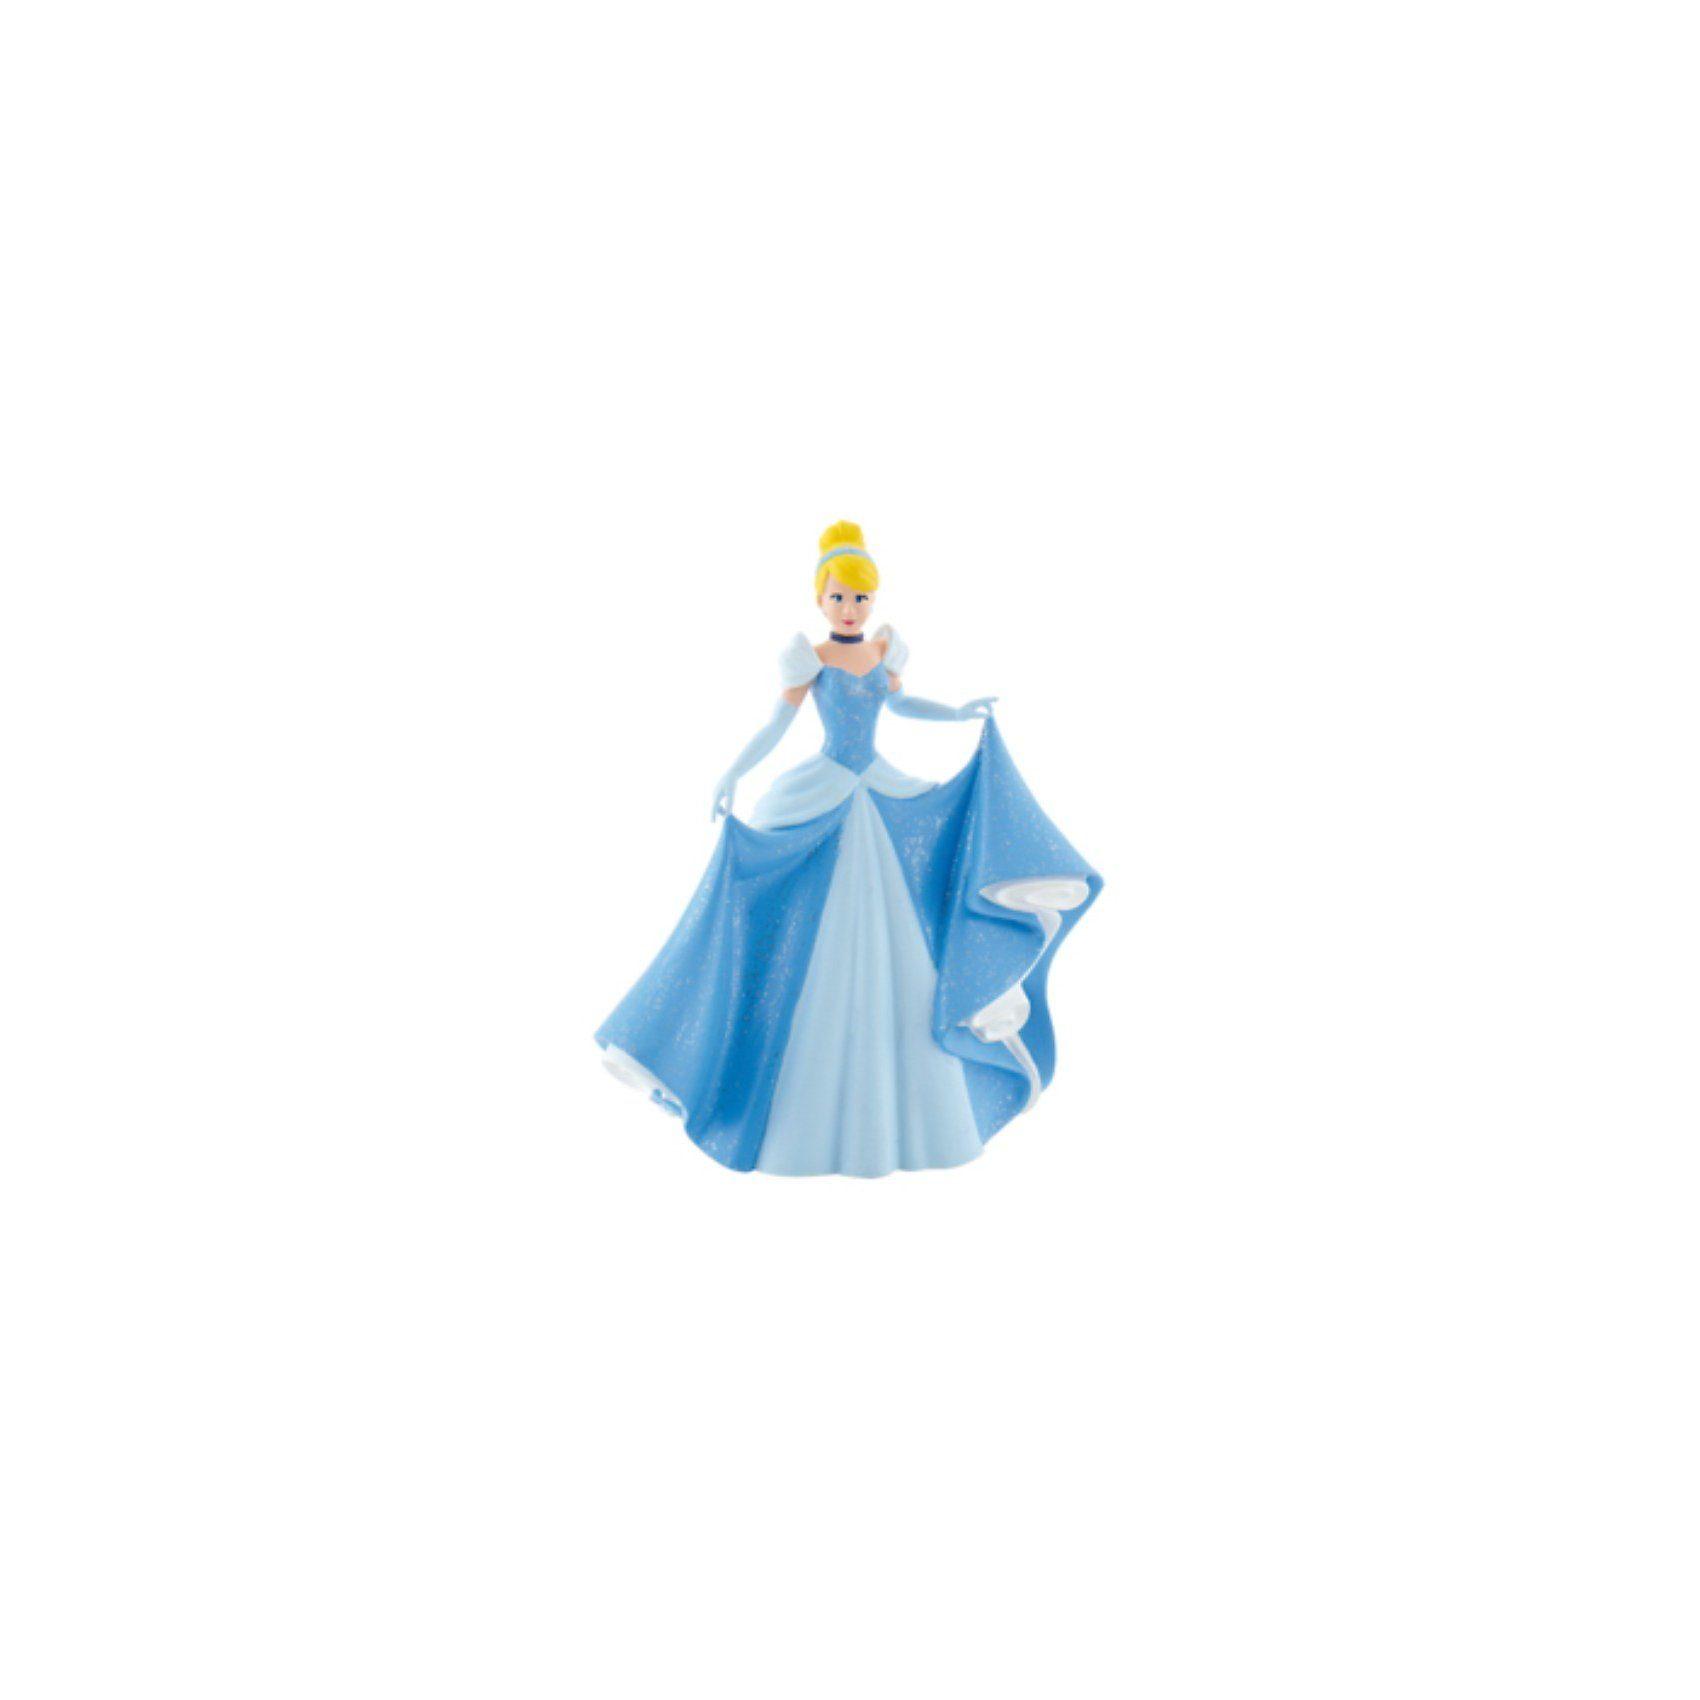 BULLYLAND Comicwelt Walt Disney Cinderella - Spielfigur Cinderella